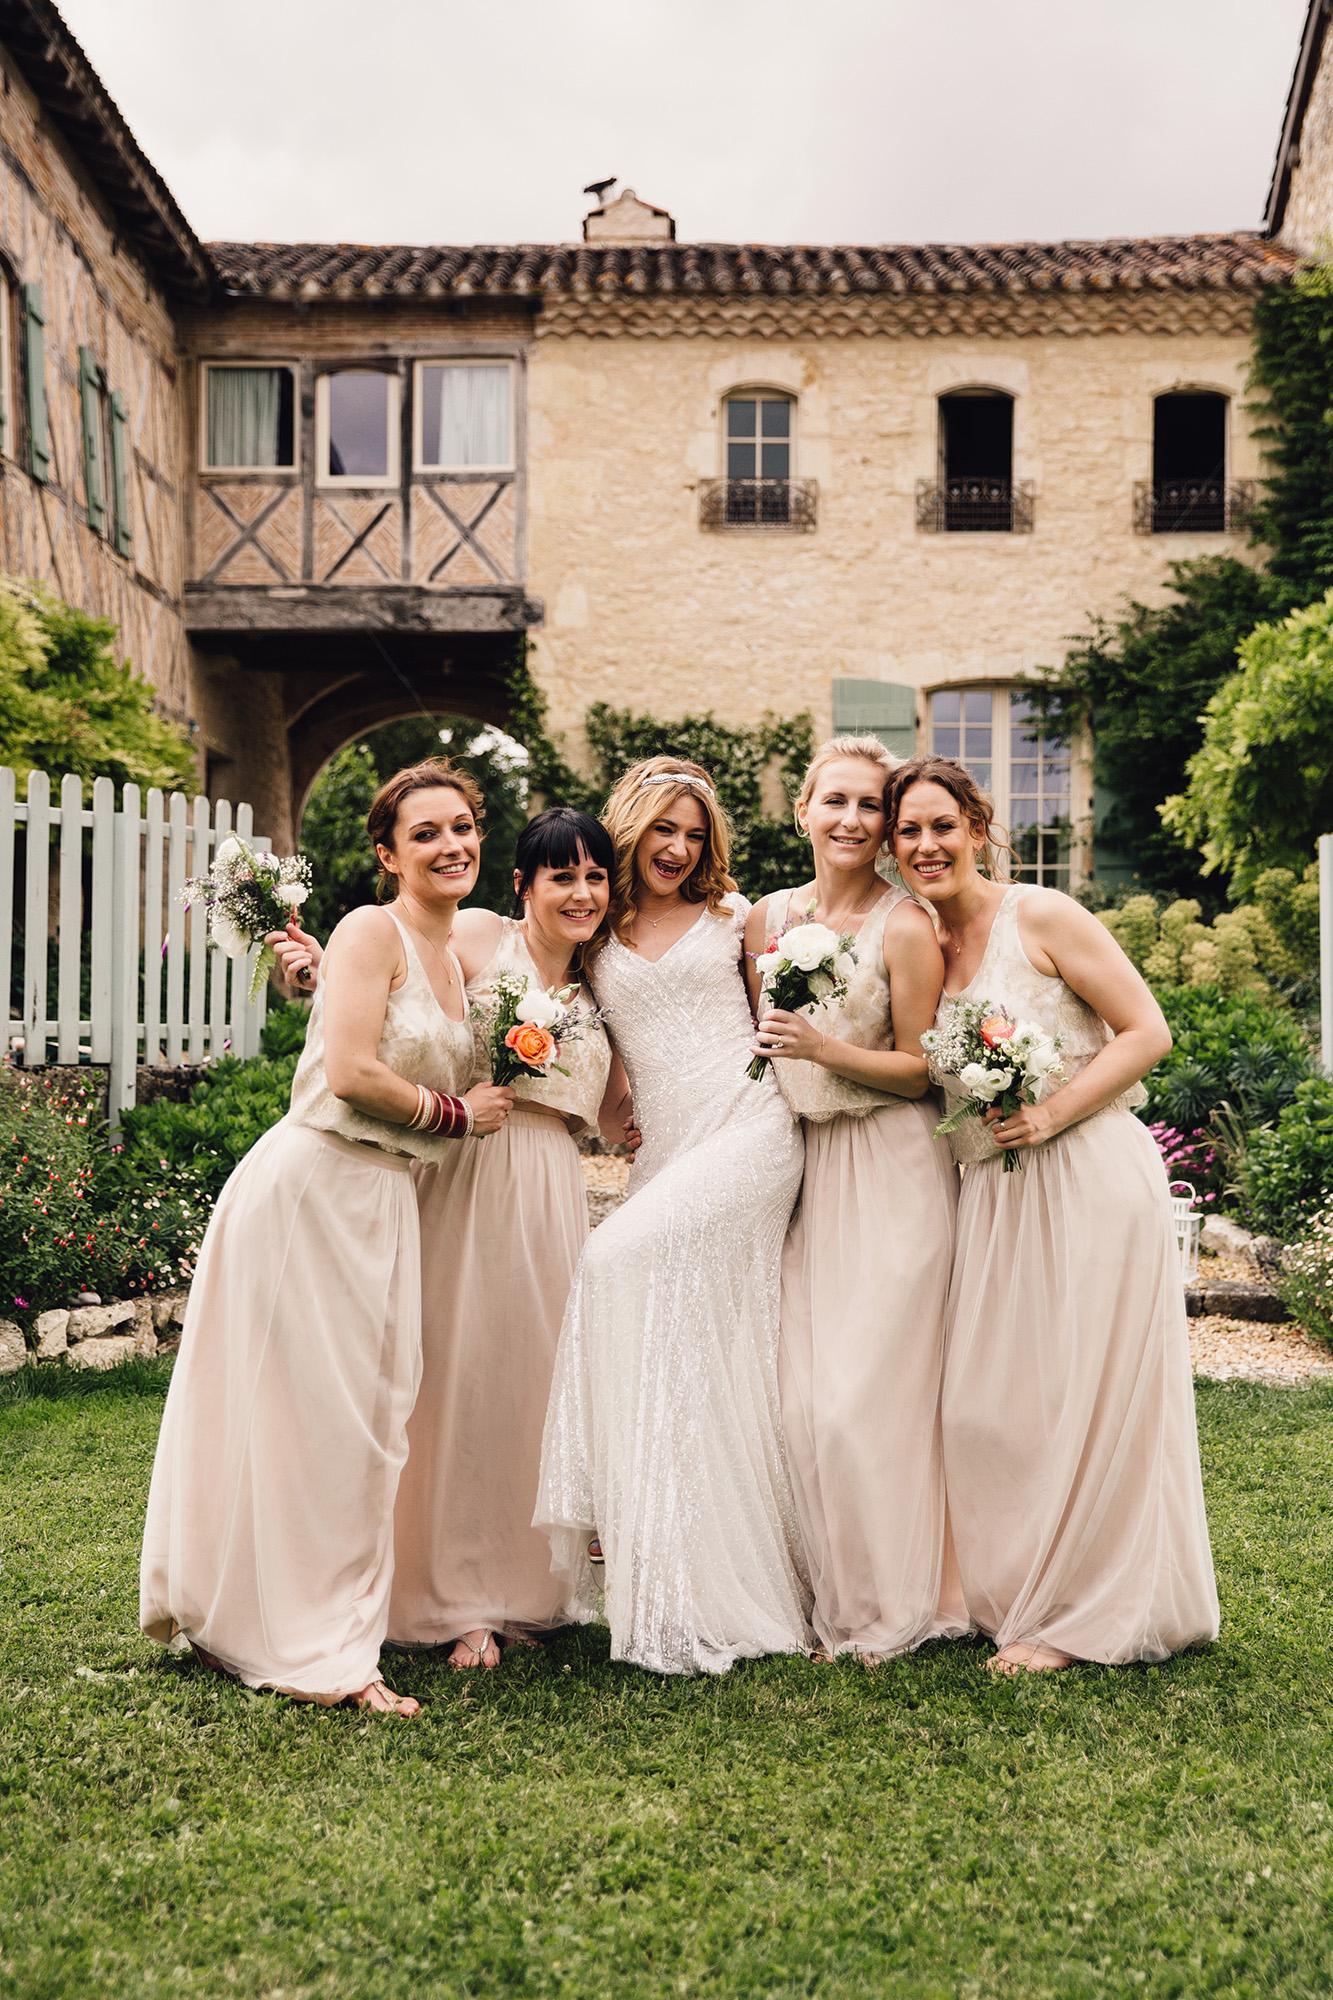 Hannah-Bespoke-Bridesmaids-Bohemian-French-Wedding-Gold-Lace-Susanna-Greening-Designs-Matlock-Derbyshire-19